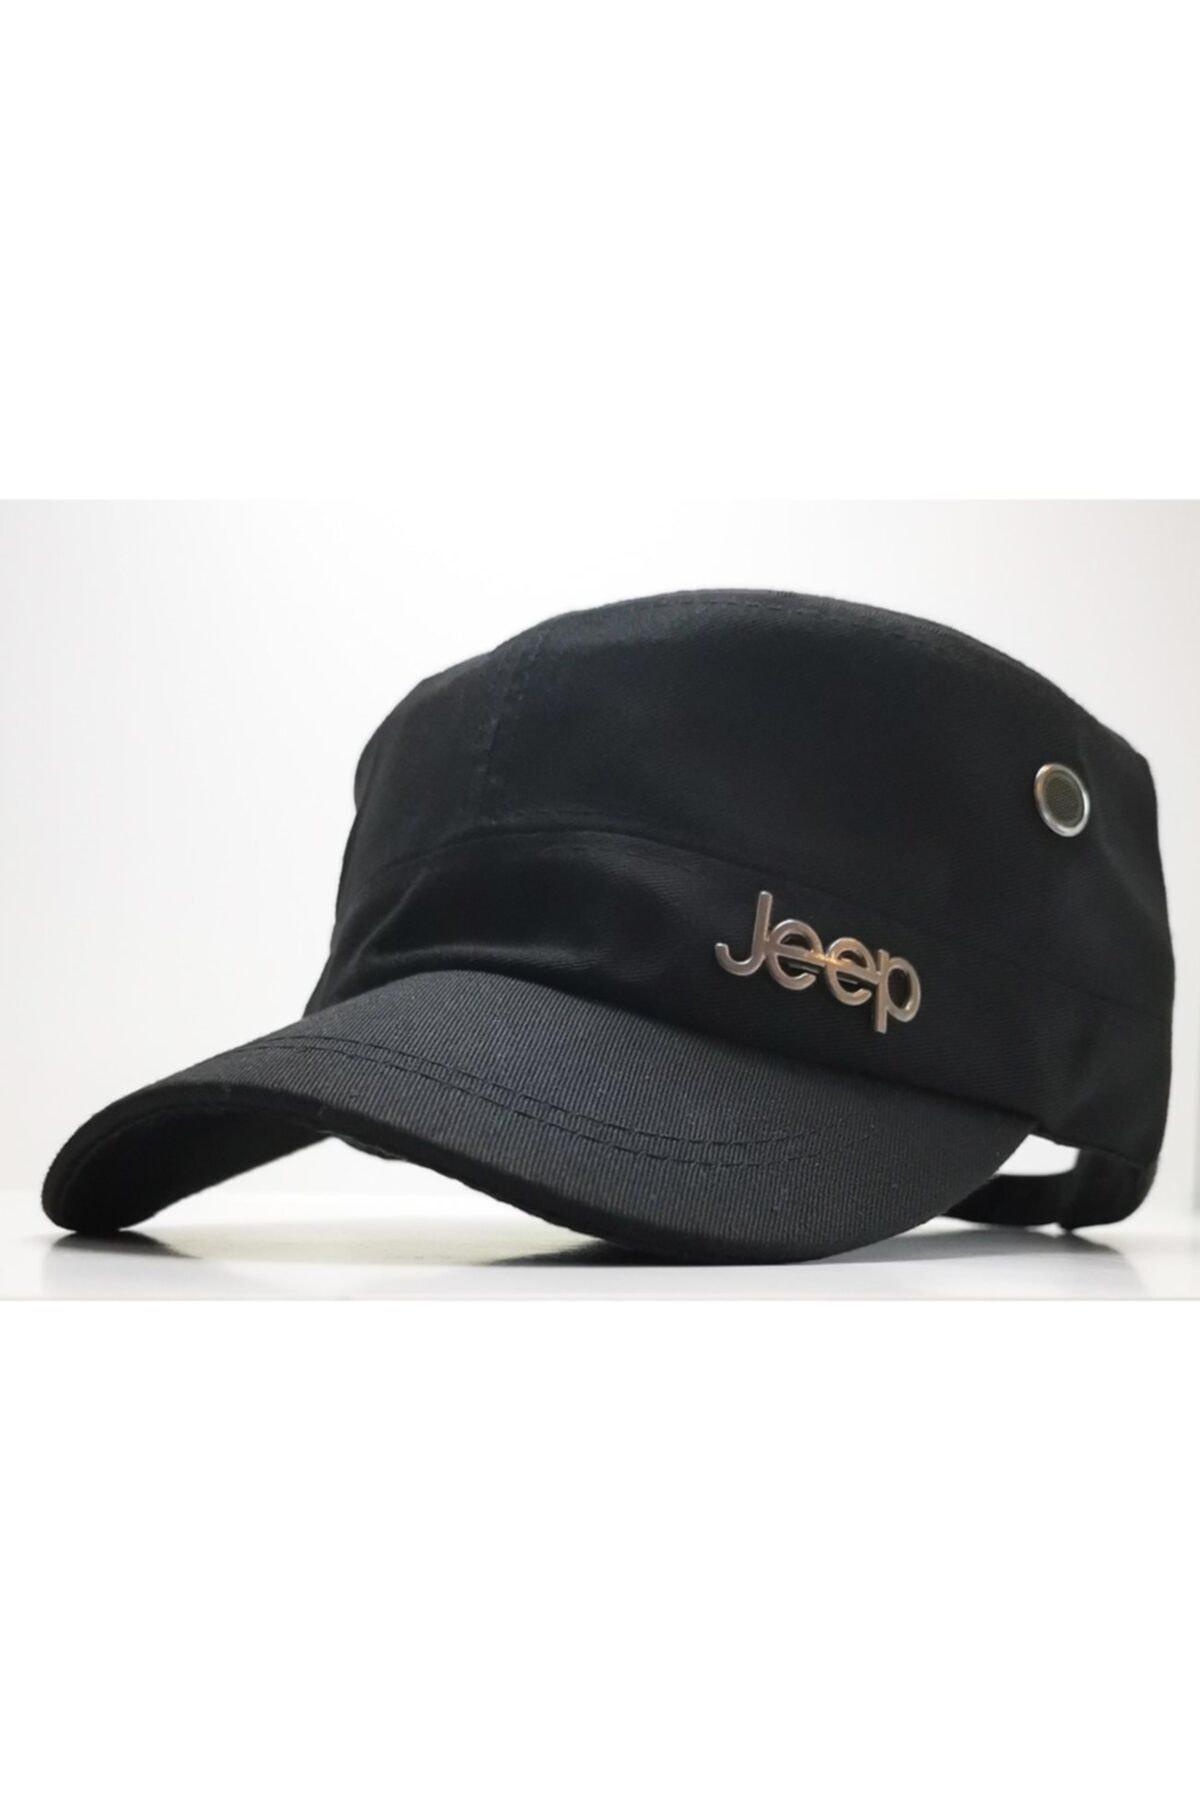 DMONA Jeep Castro Tarzı Siyah Şapka 1